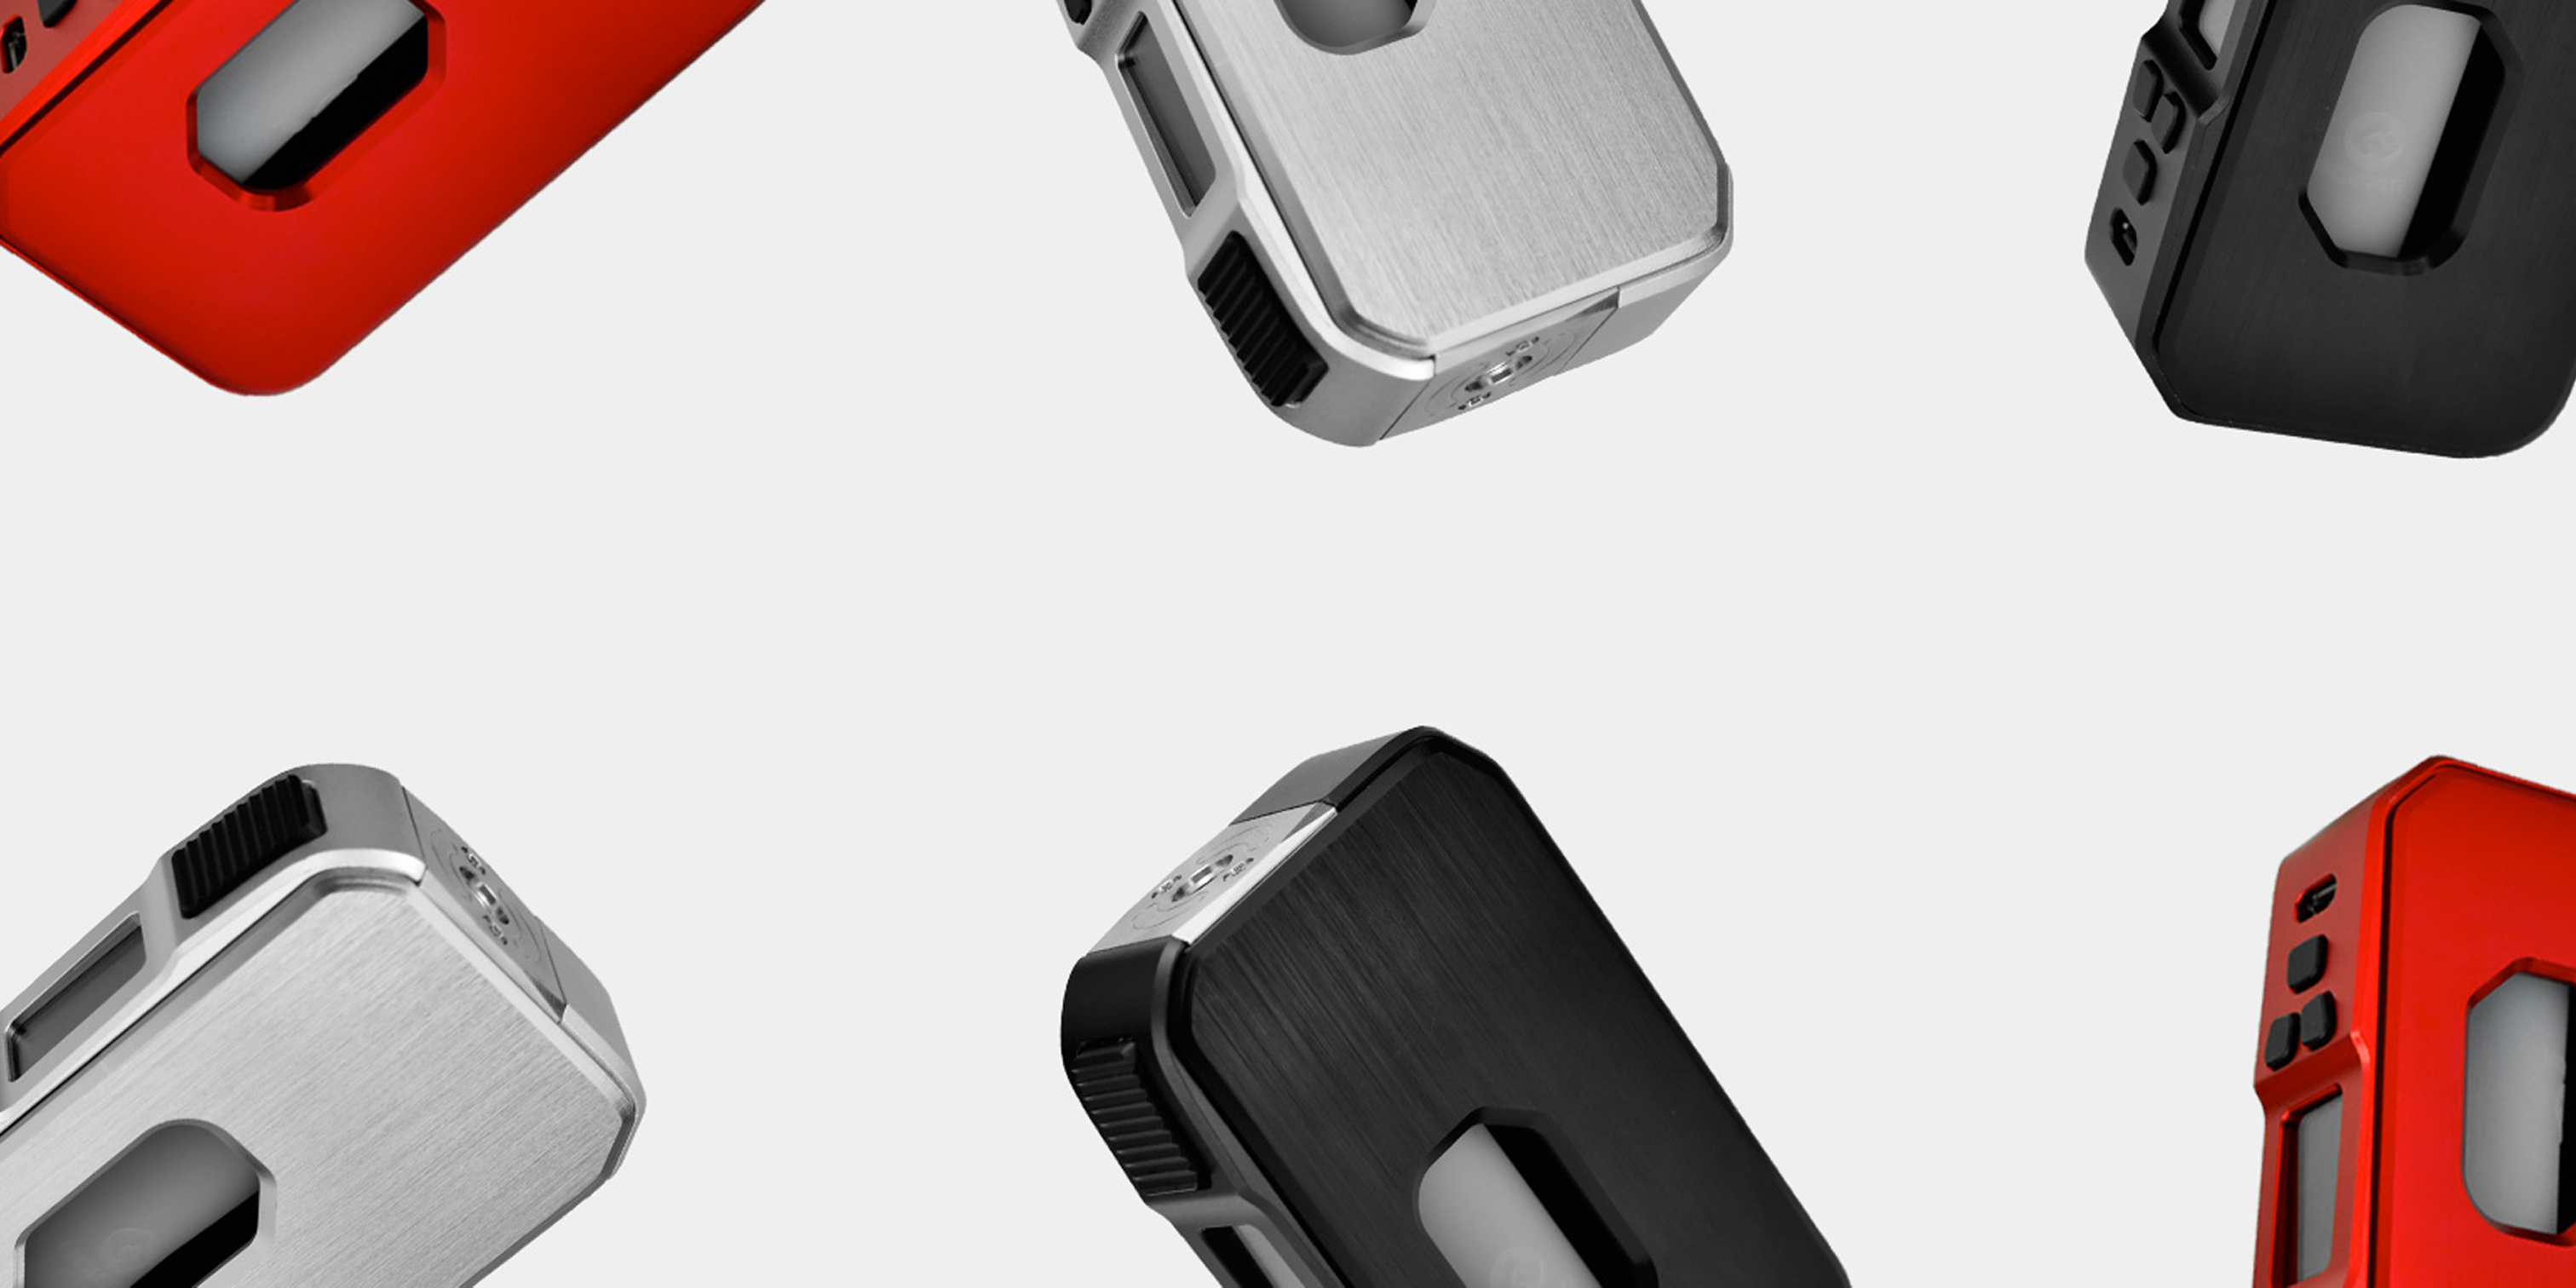 vjp11 - 【レビュー】機能&デザインともに大満足なテクスコ Hcigar Aurora 80W 21700 Squonk MOD(エイチシガー オーロラモッド)はテクニカル勢マストバイなアイテム